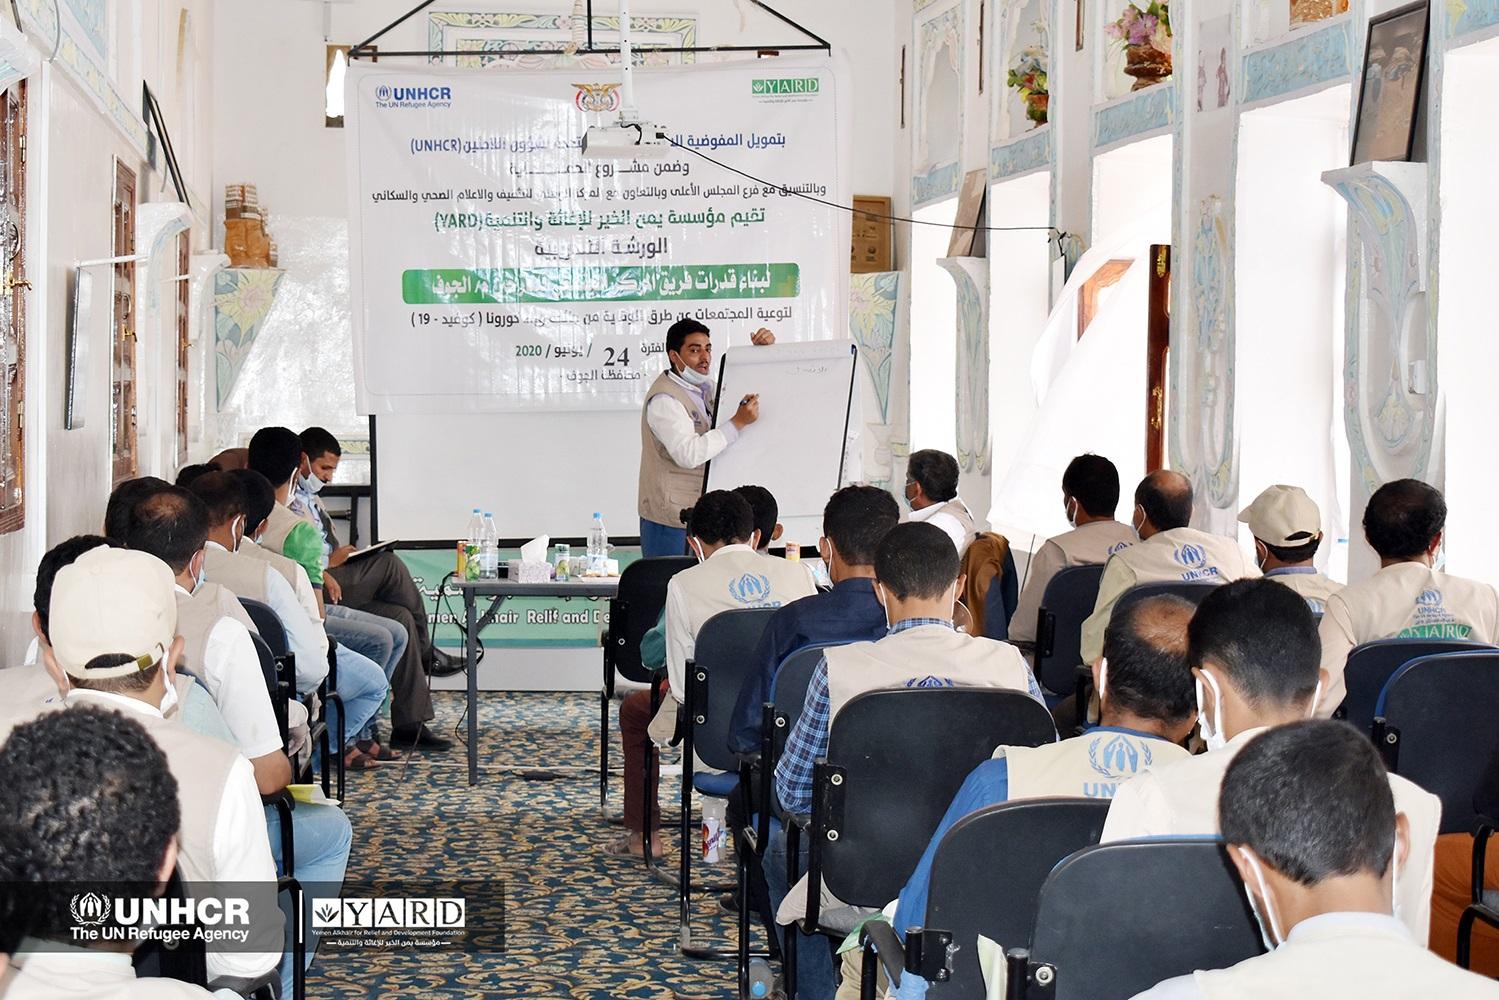 YARD Holds Training Workshop on Precautionary Prevention to Face Coronavirus Pandemic (COVID-19)